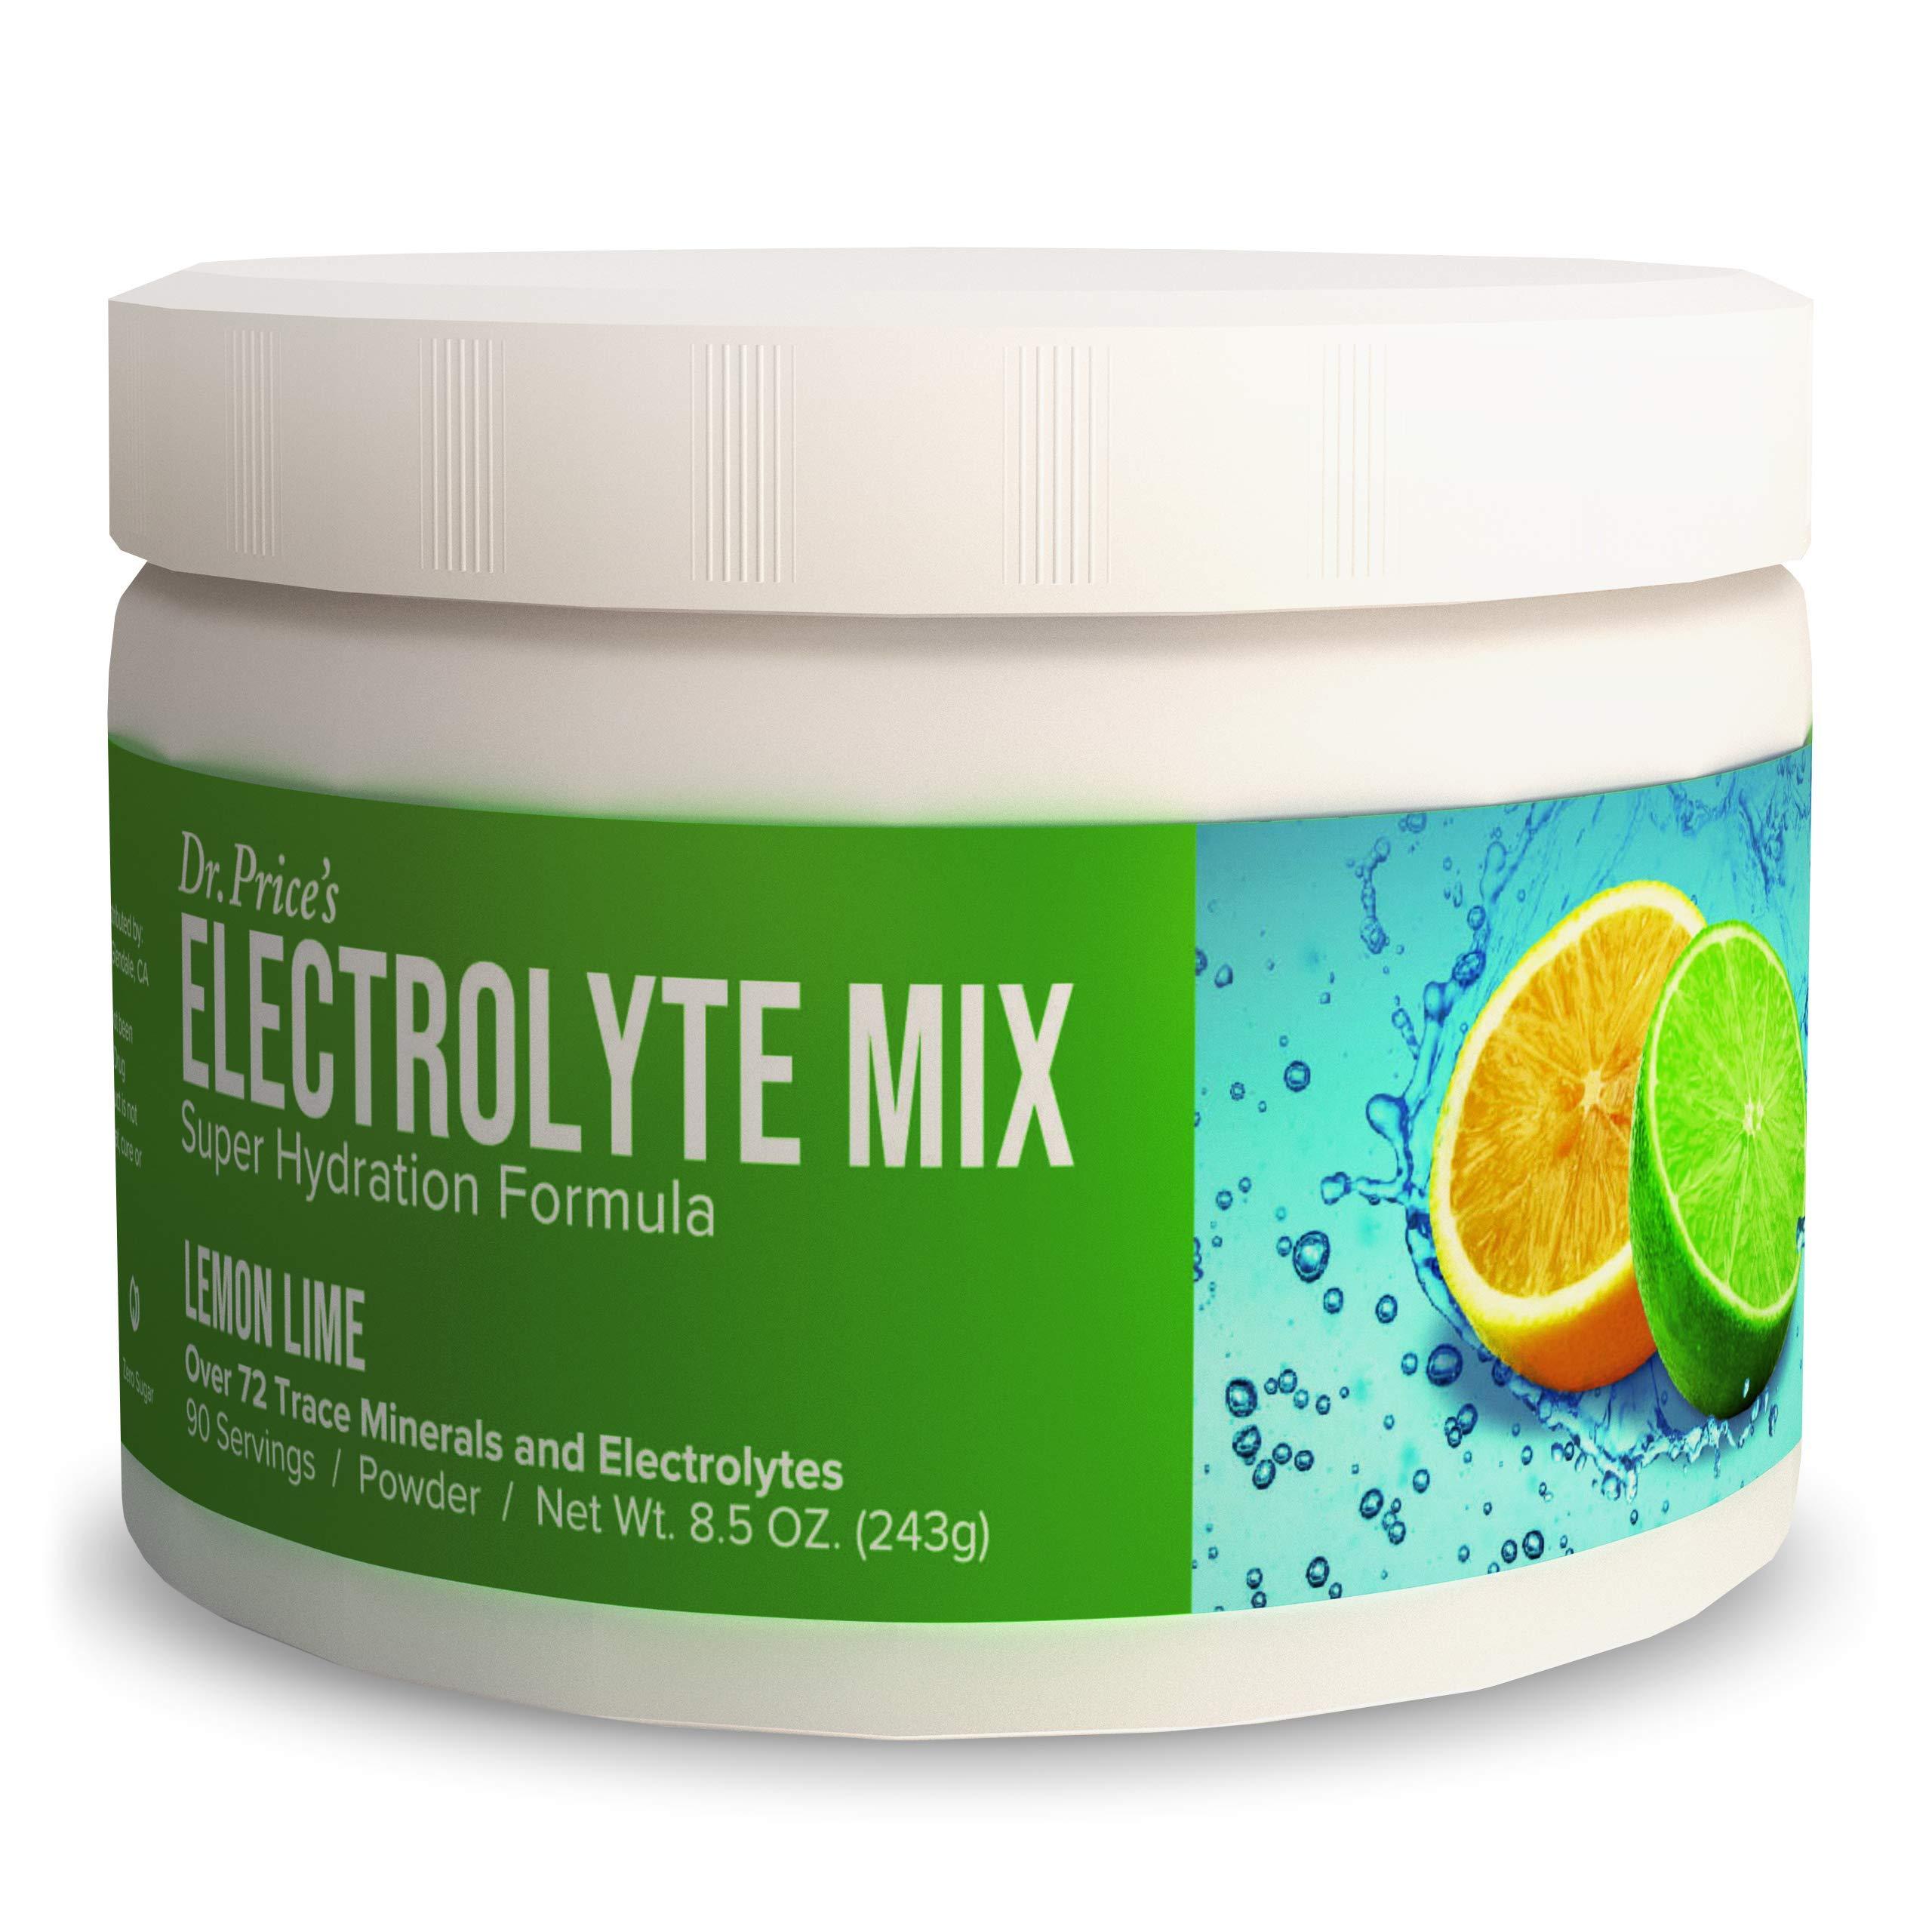 Electrolyte Mix Supplement Powder, 90 Servings, 72 Trace Minerals, Potassium, Sodium, Electrolyte Replacement Keto Drink   Lemon-Lime Flavor   Dr. Price's Vitamins, No Sugar, Vegan, Non-GMO